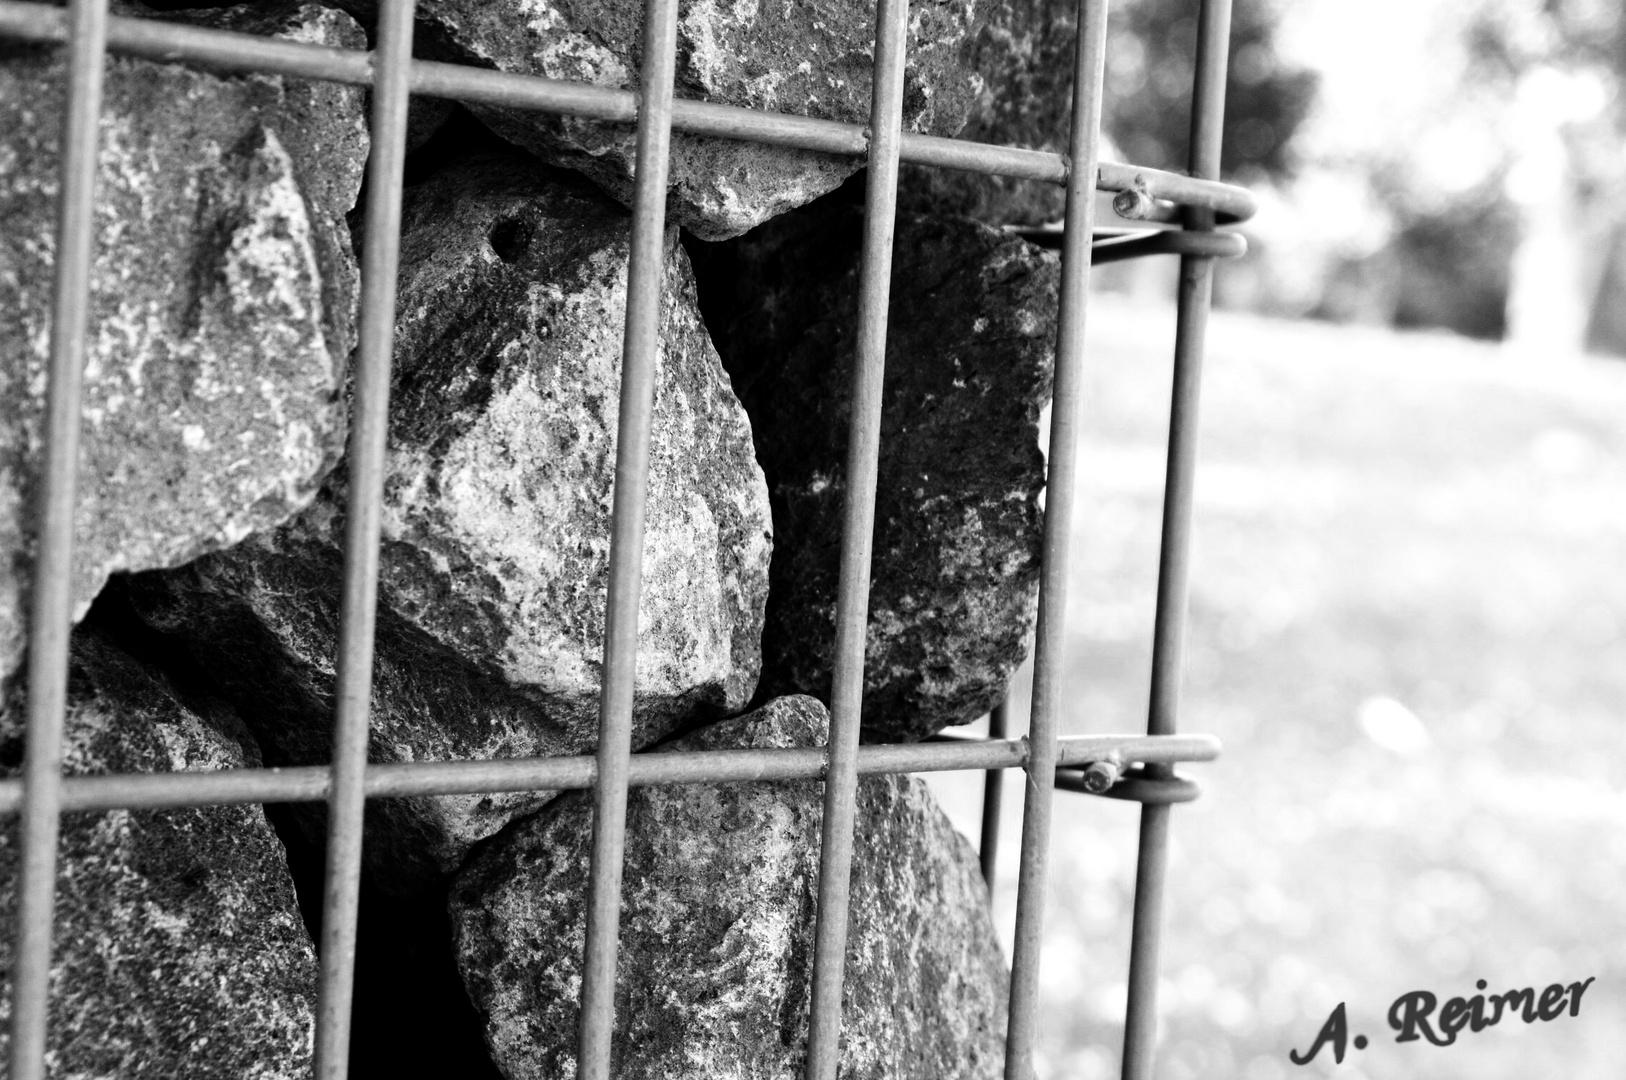 inprisoned